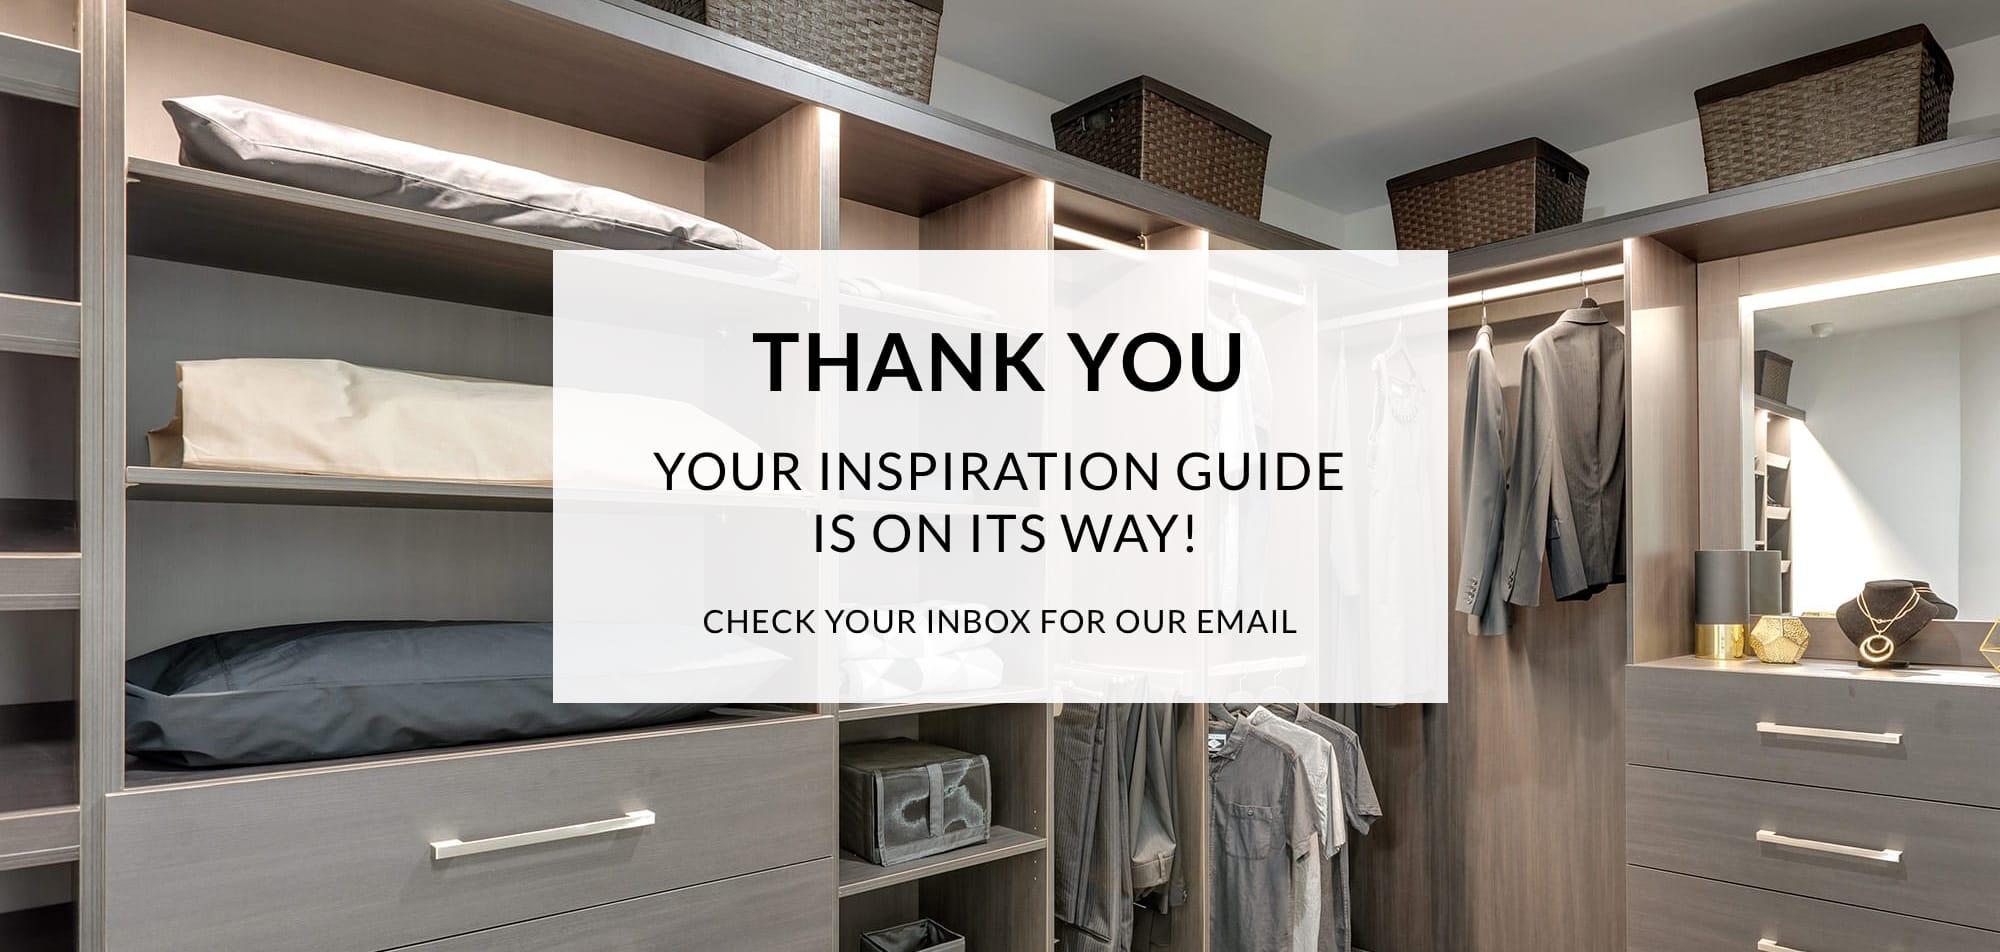 Thank you wardrobe